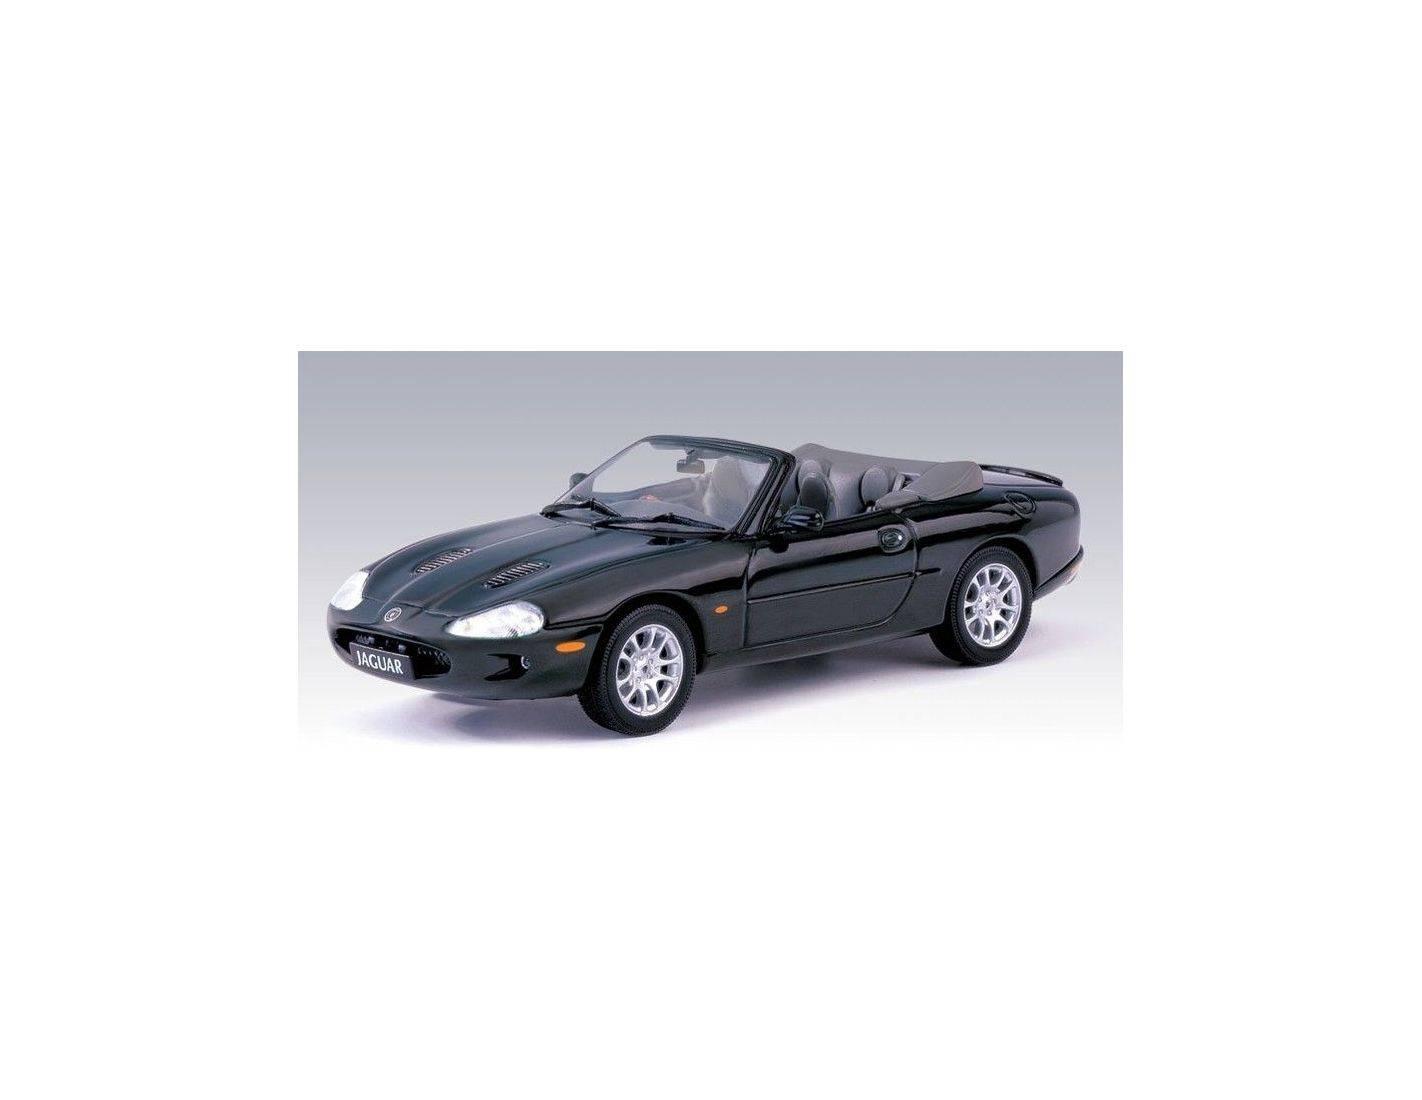 auto art gateway 53701 jaguar xkr cabrio green 1 43. Black Bedroom Furniture Sets. Home Design Ideas